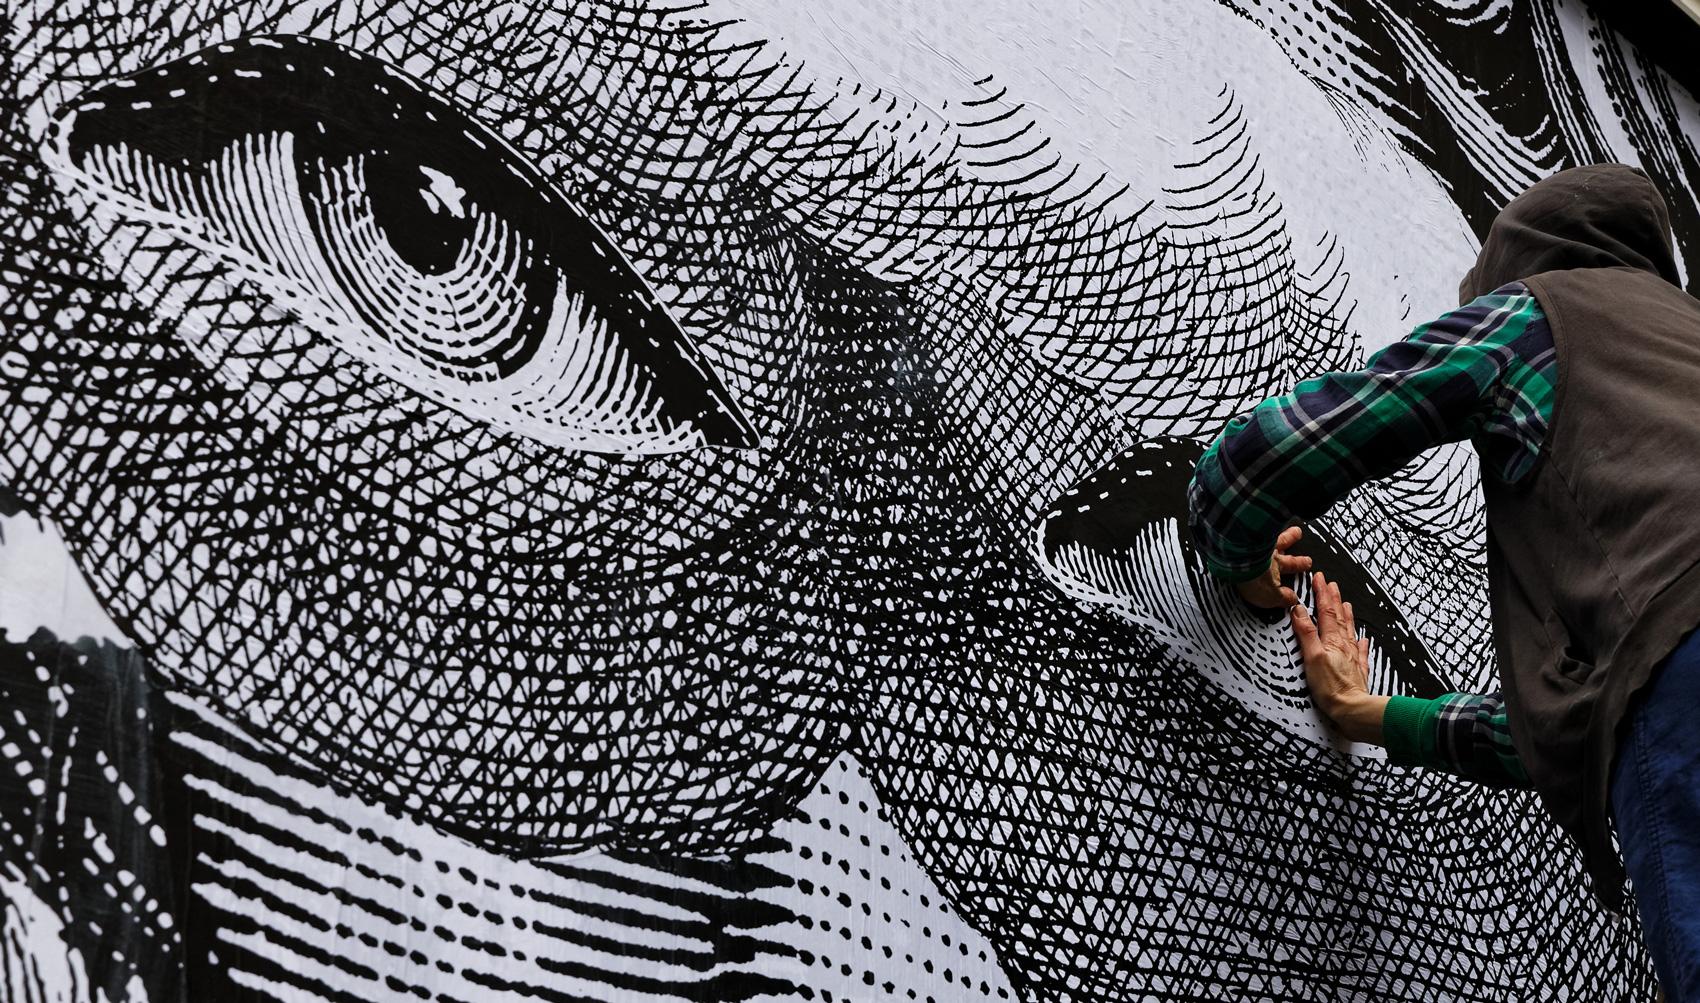 collage-oeil-Mur-de-Rennes-Mur11-13bis-@Monique-Sammut